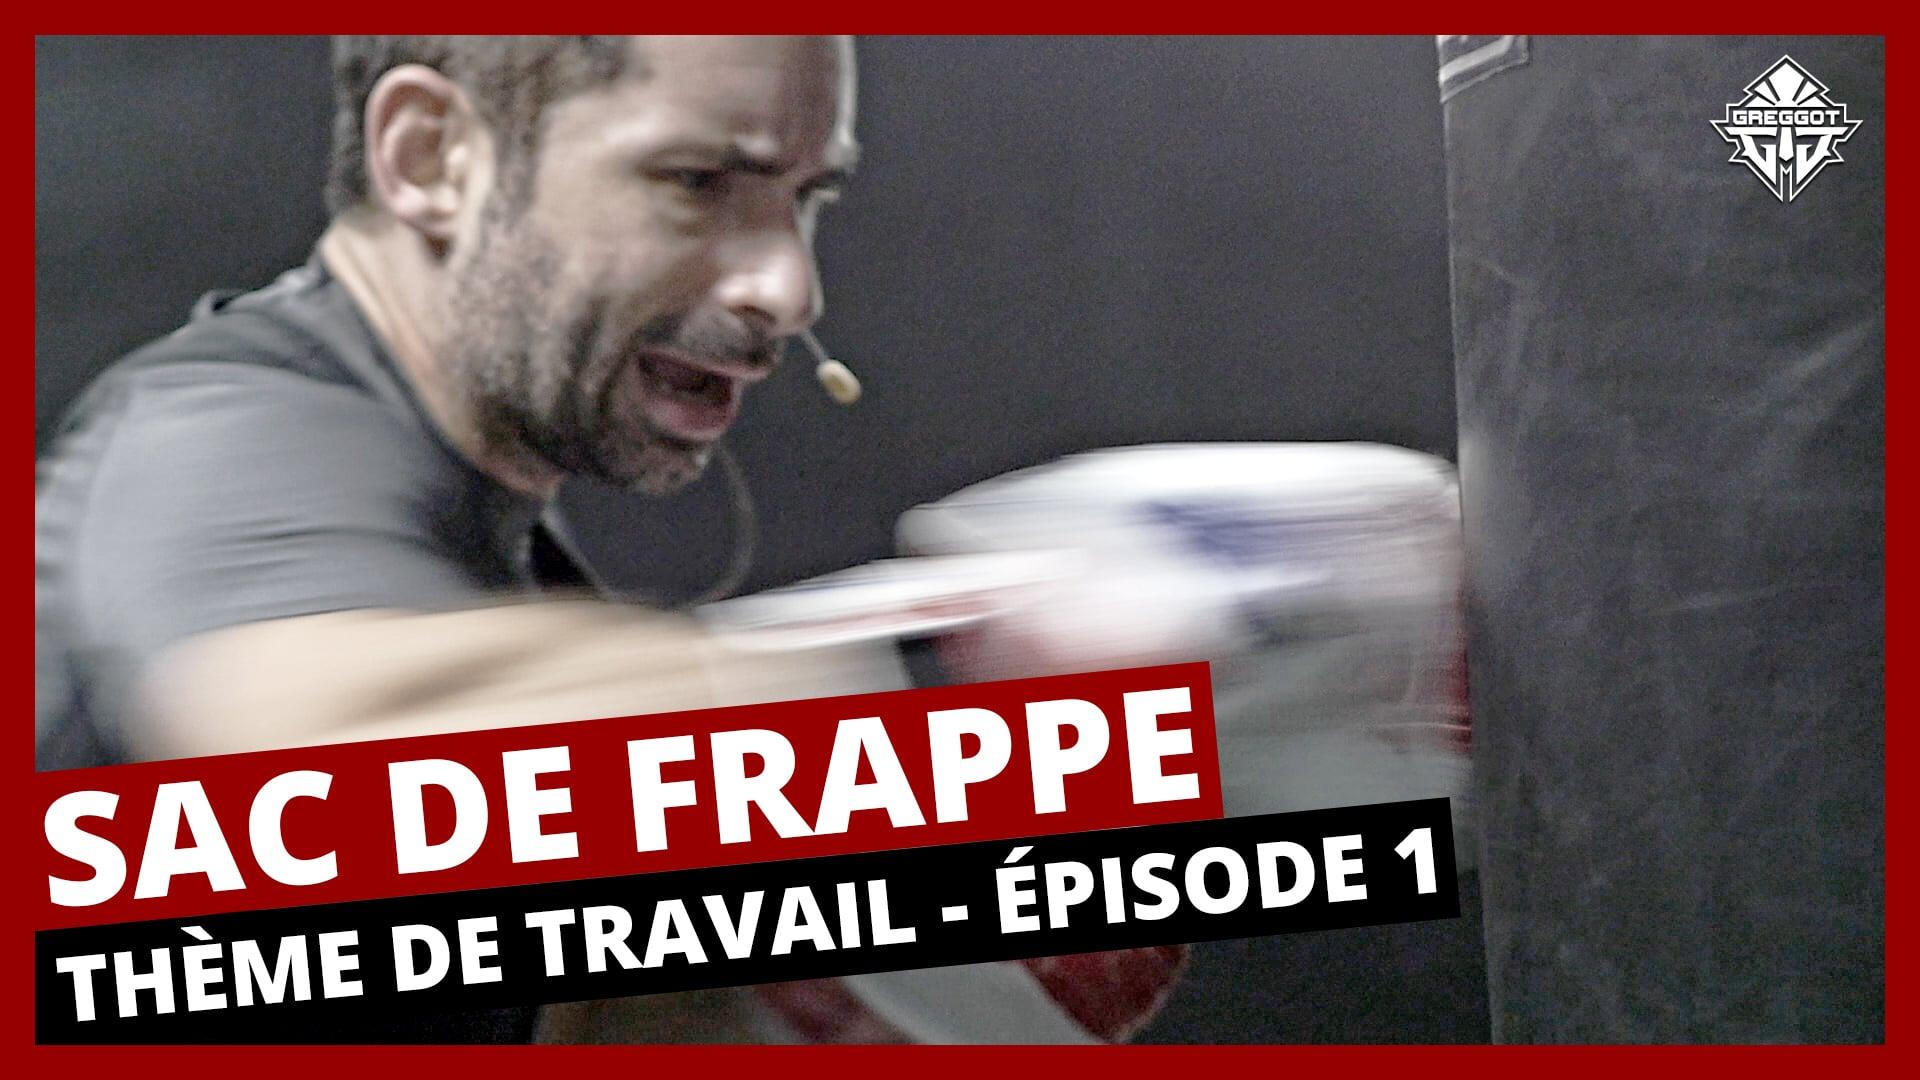 Sac-Frappe-Theme-Travail-Episode-01-VIDEO